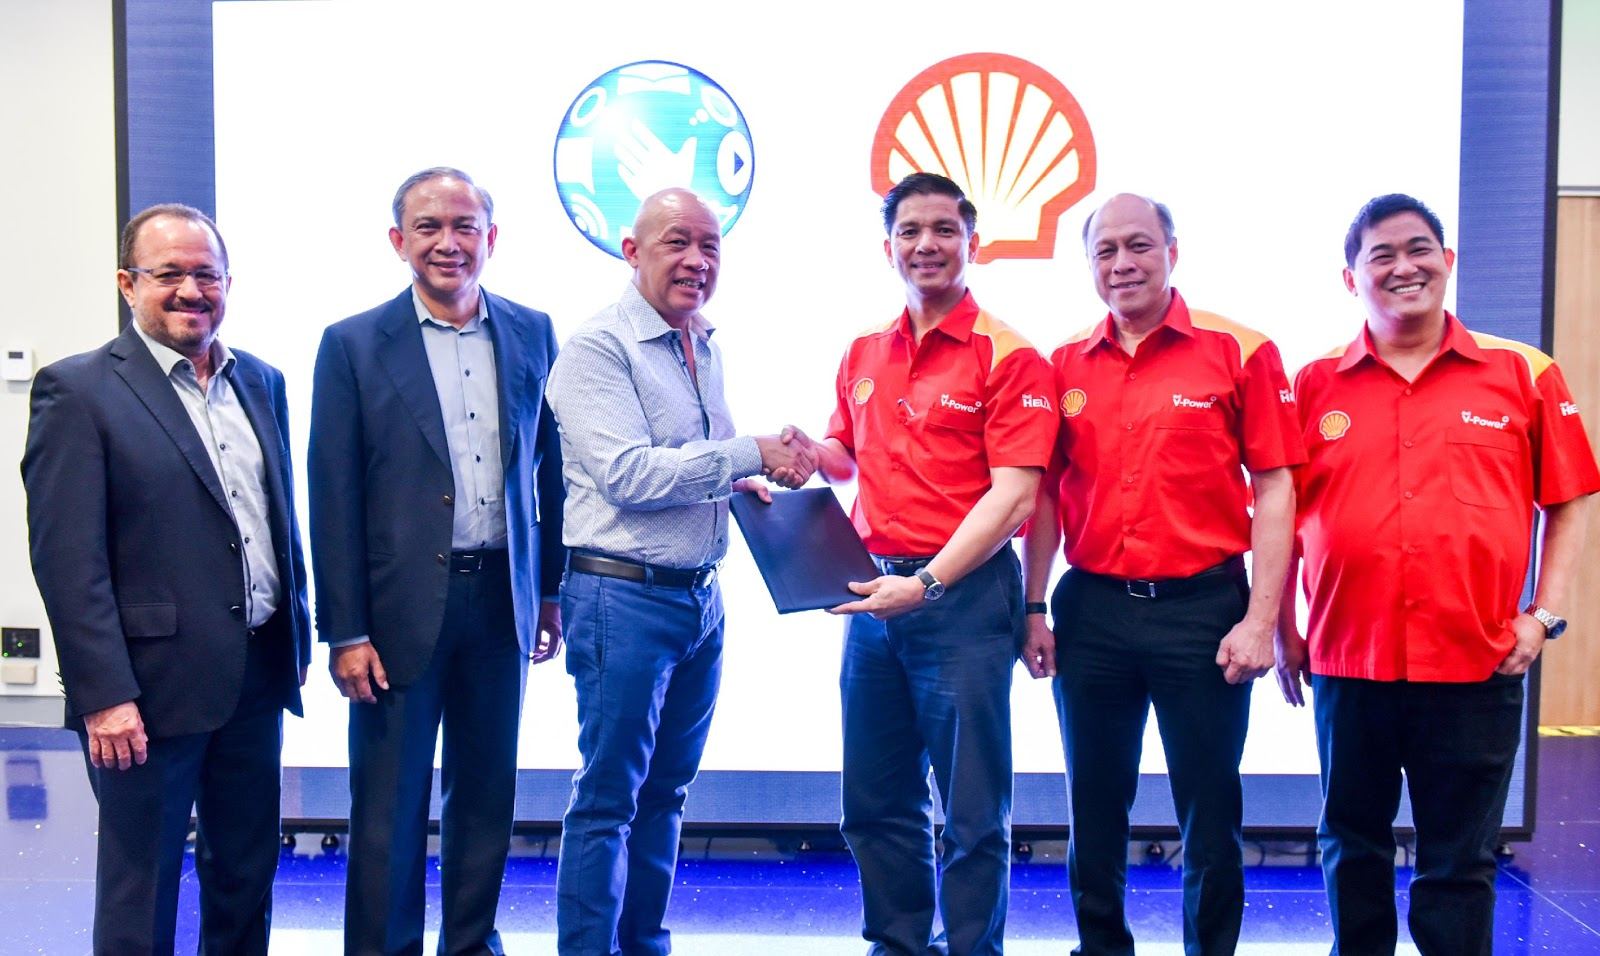 globe telecom signs partnership - HD1600×956